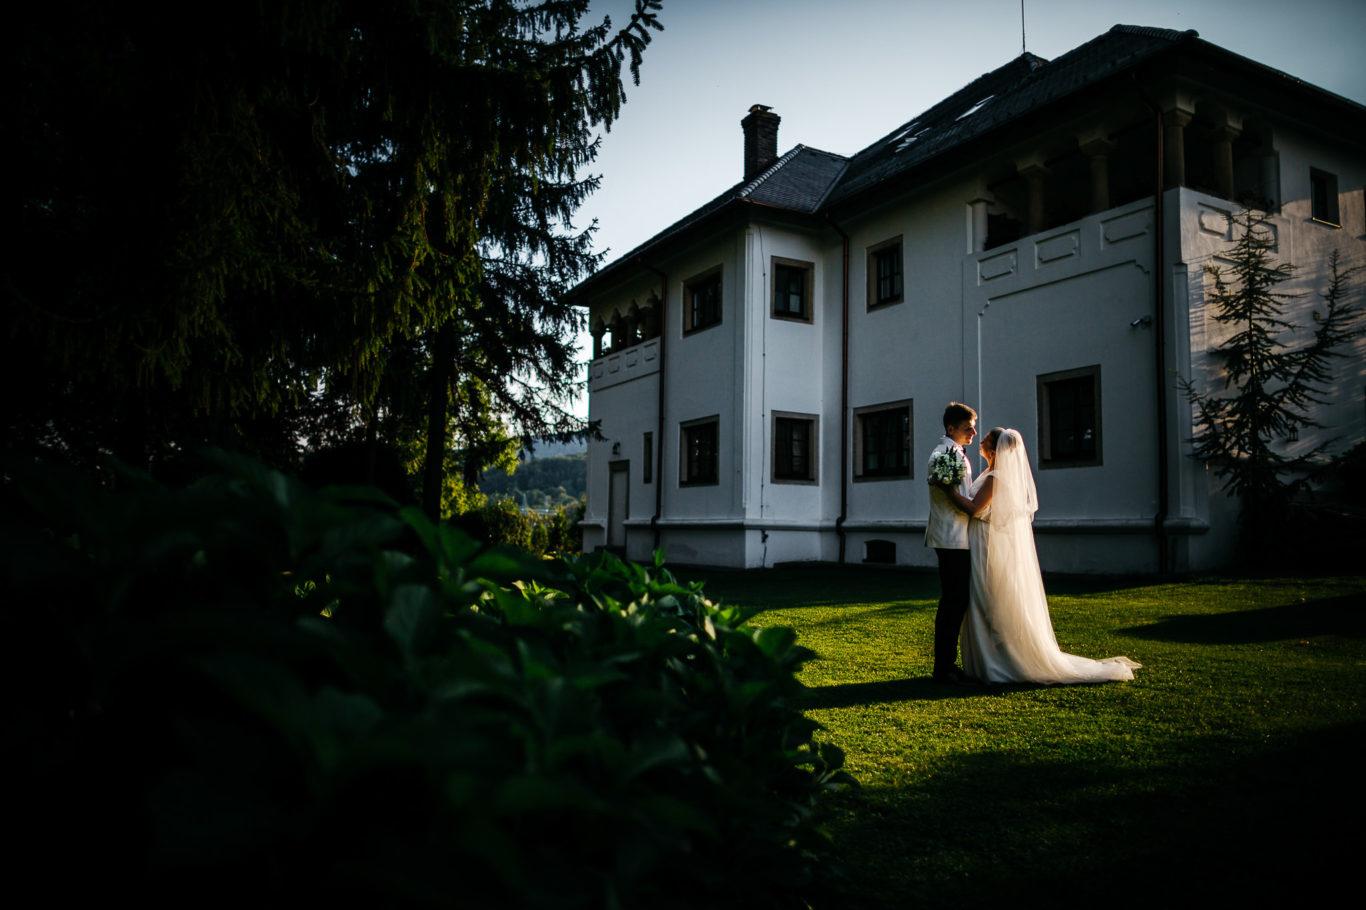 0446-fotoreportaj-nunta-conacul-maldar-cristina-stefan-fotograf-ciprian-dumitrescu-dc1_2599